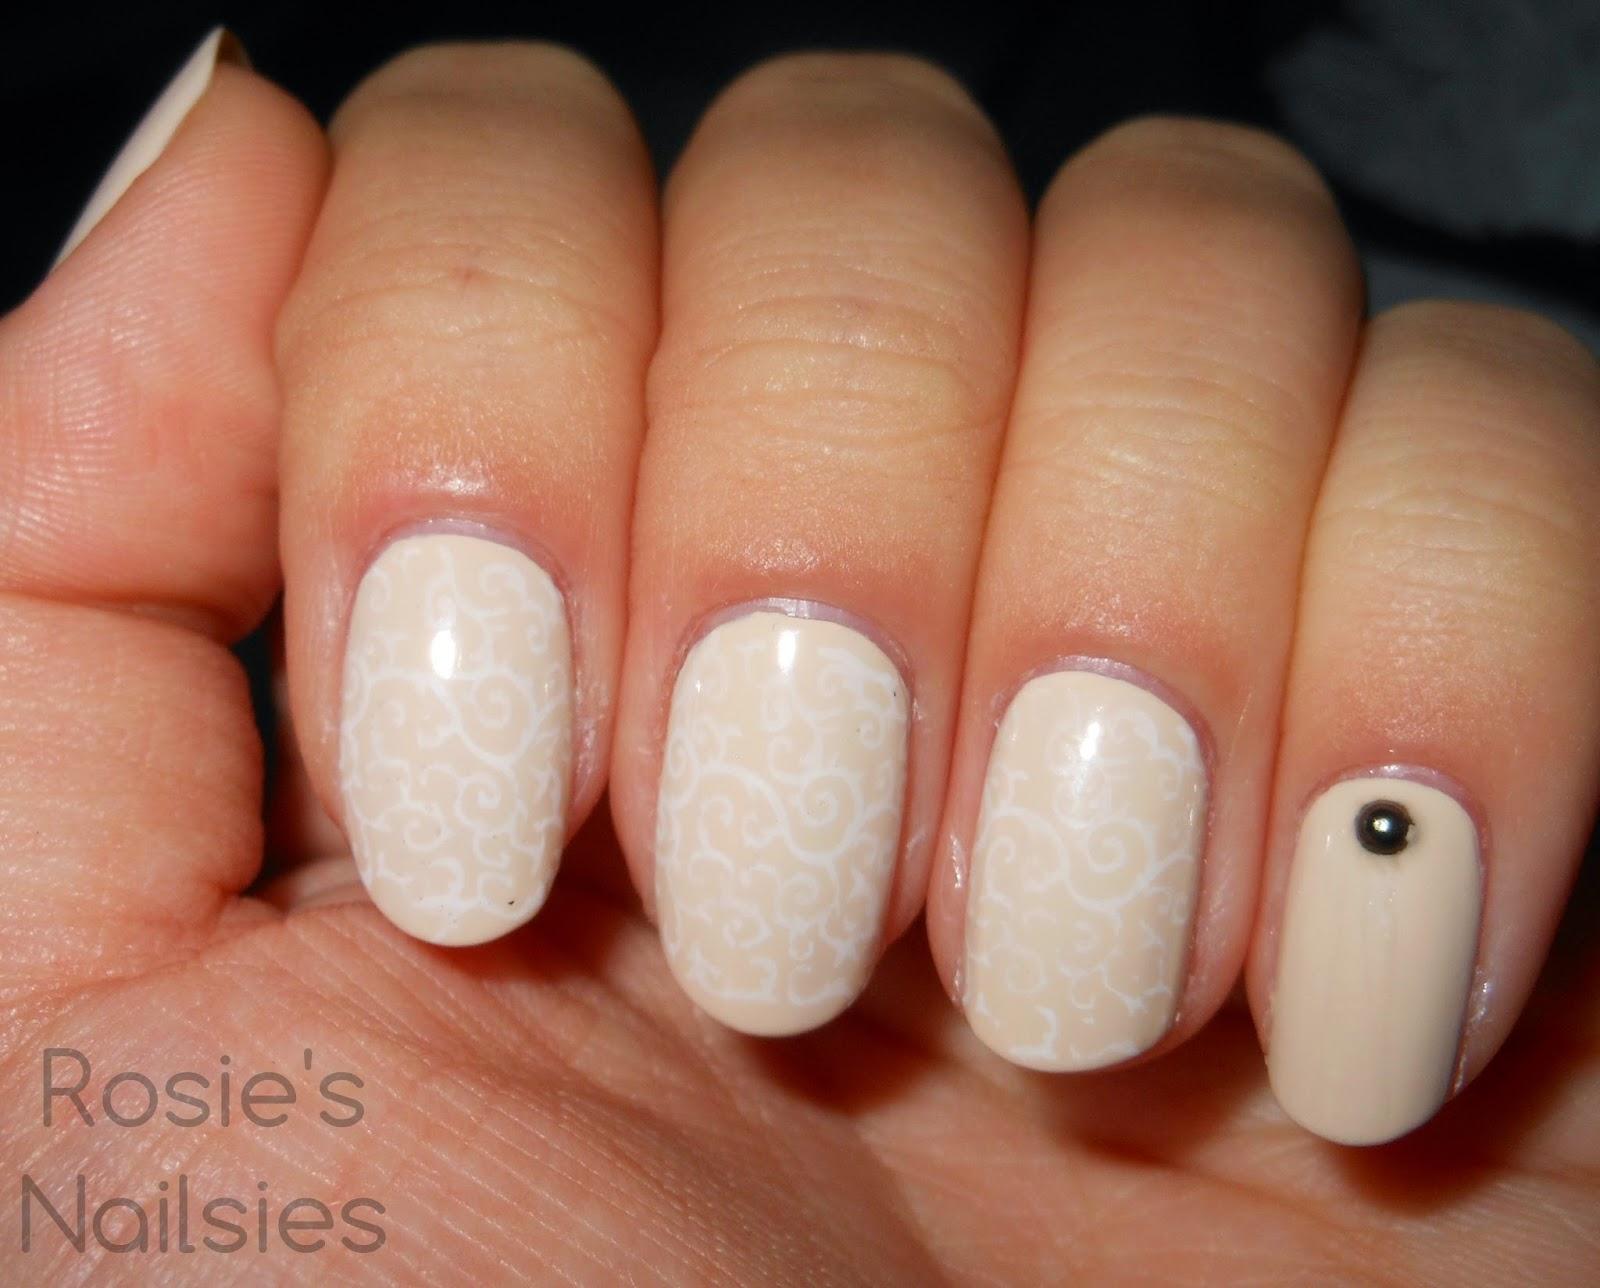 Rosie\'s Nailsies: Anniversary Nails